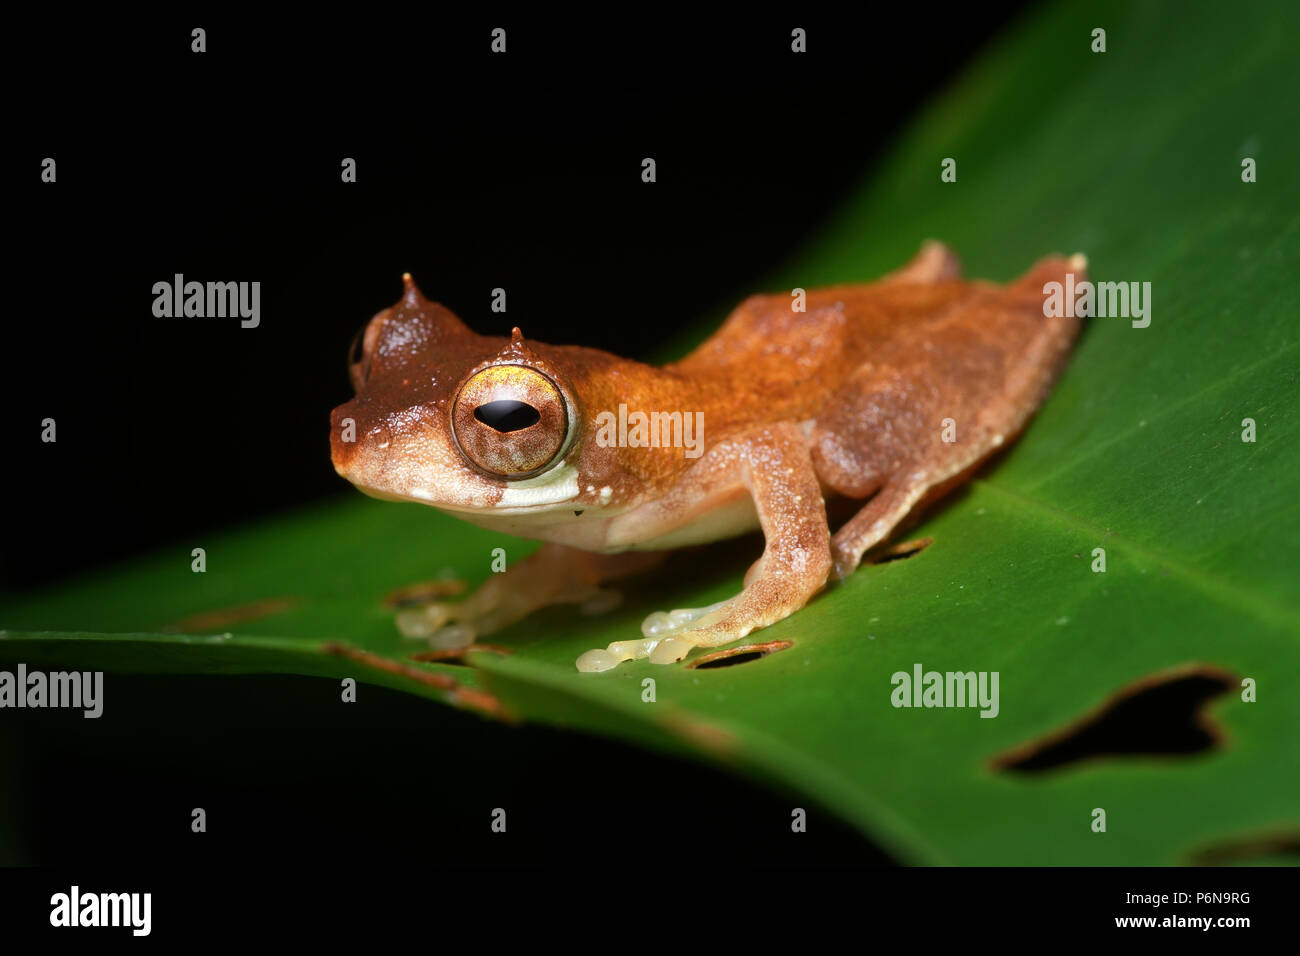 Short-nosed tree frog Rhacophorus gauni - Stock Image